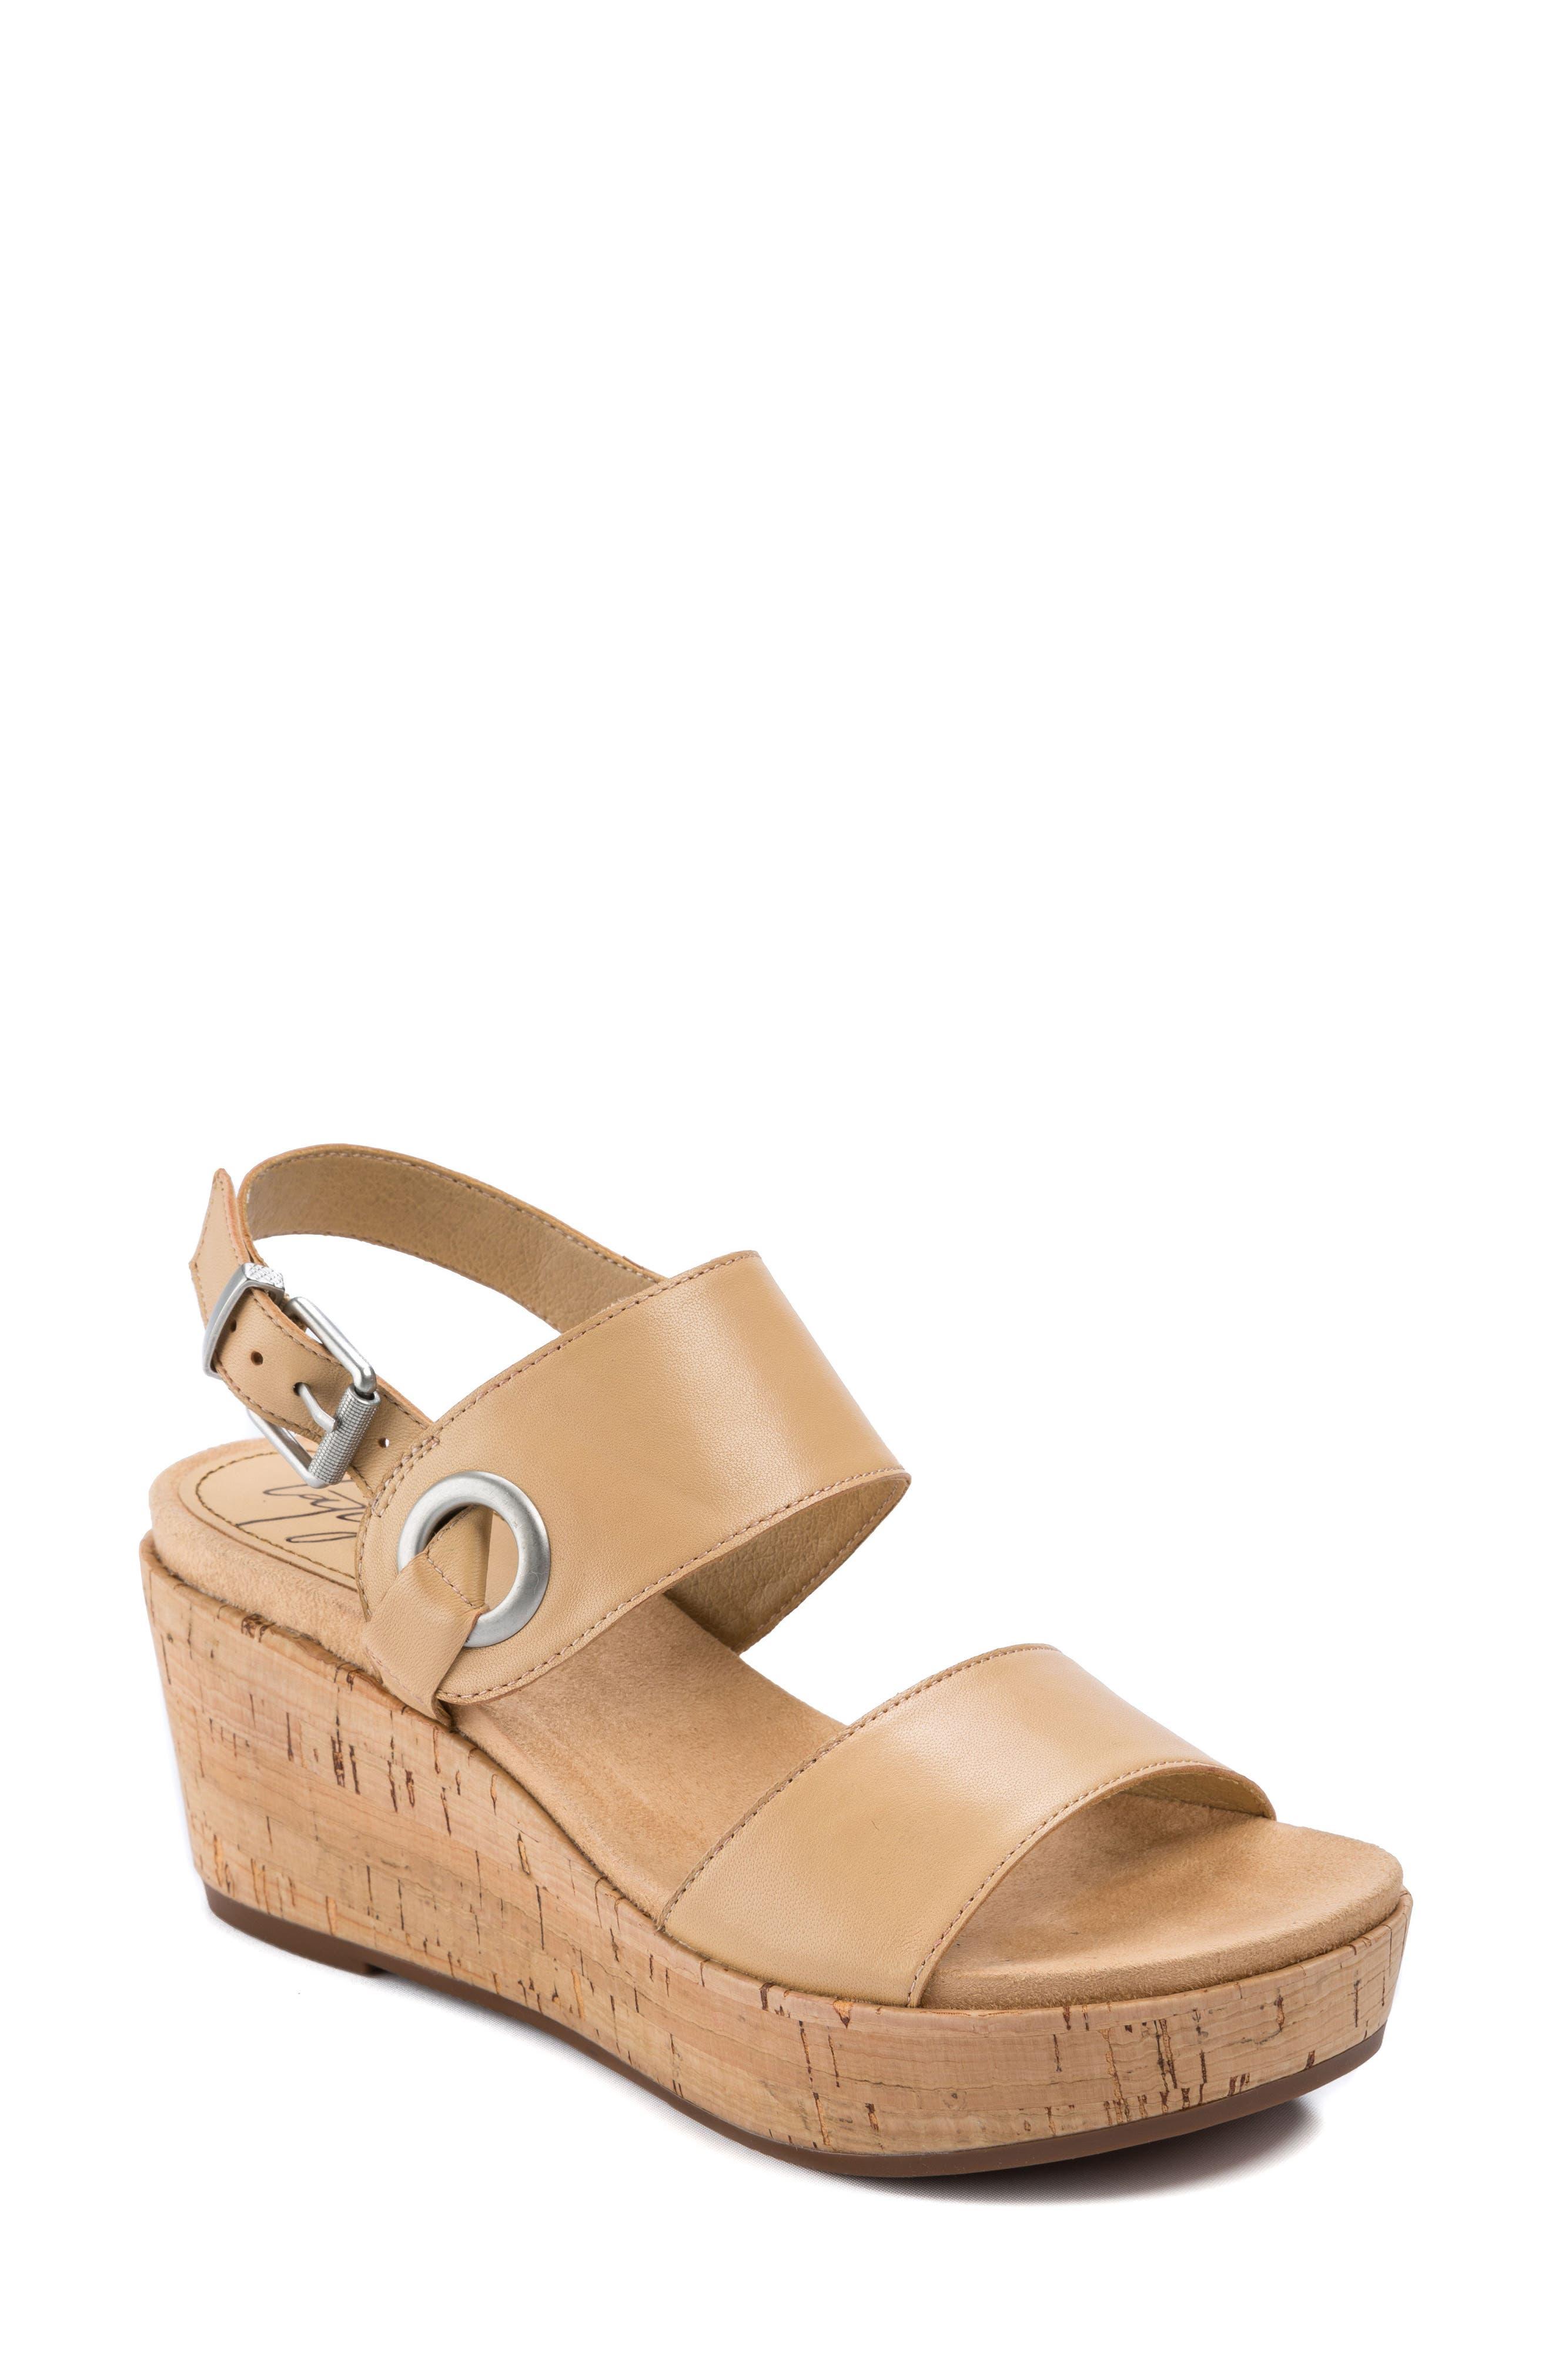 Lauren Platform Wedge Sandal,                             Main thumbnail 2, color,